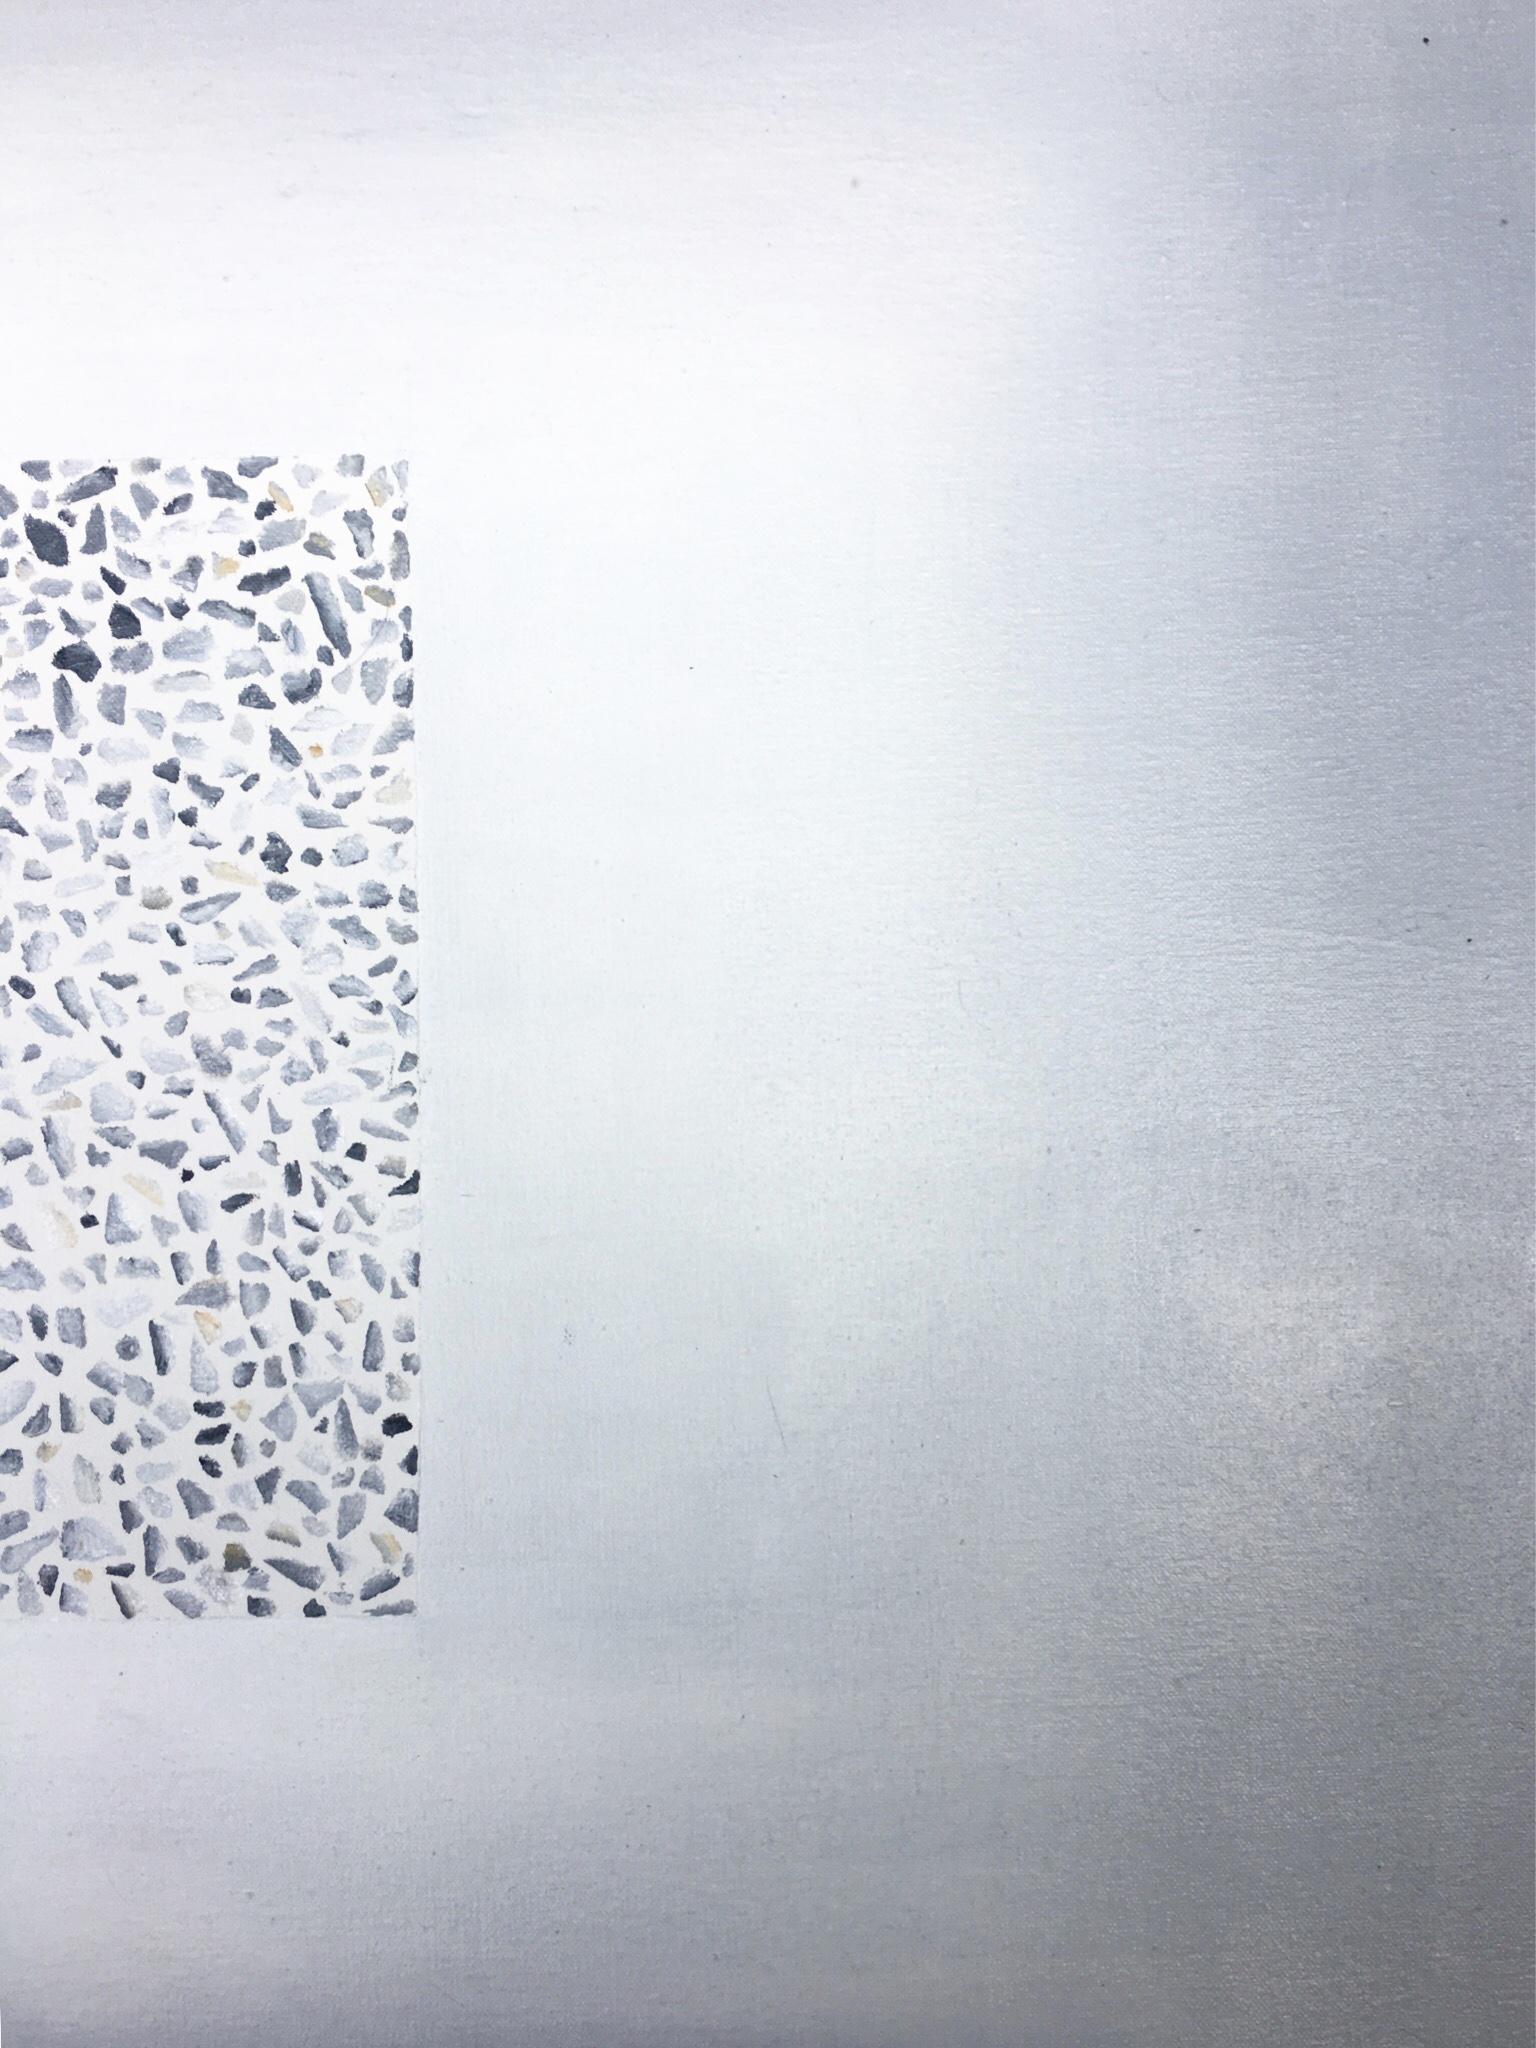 Adina West,  Concrete , 2018, oil on canvas.